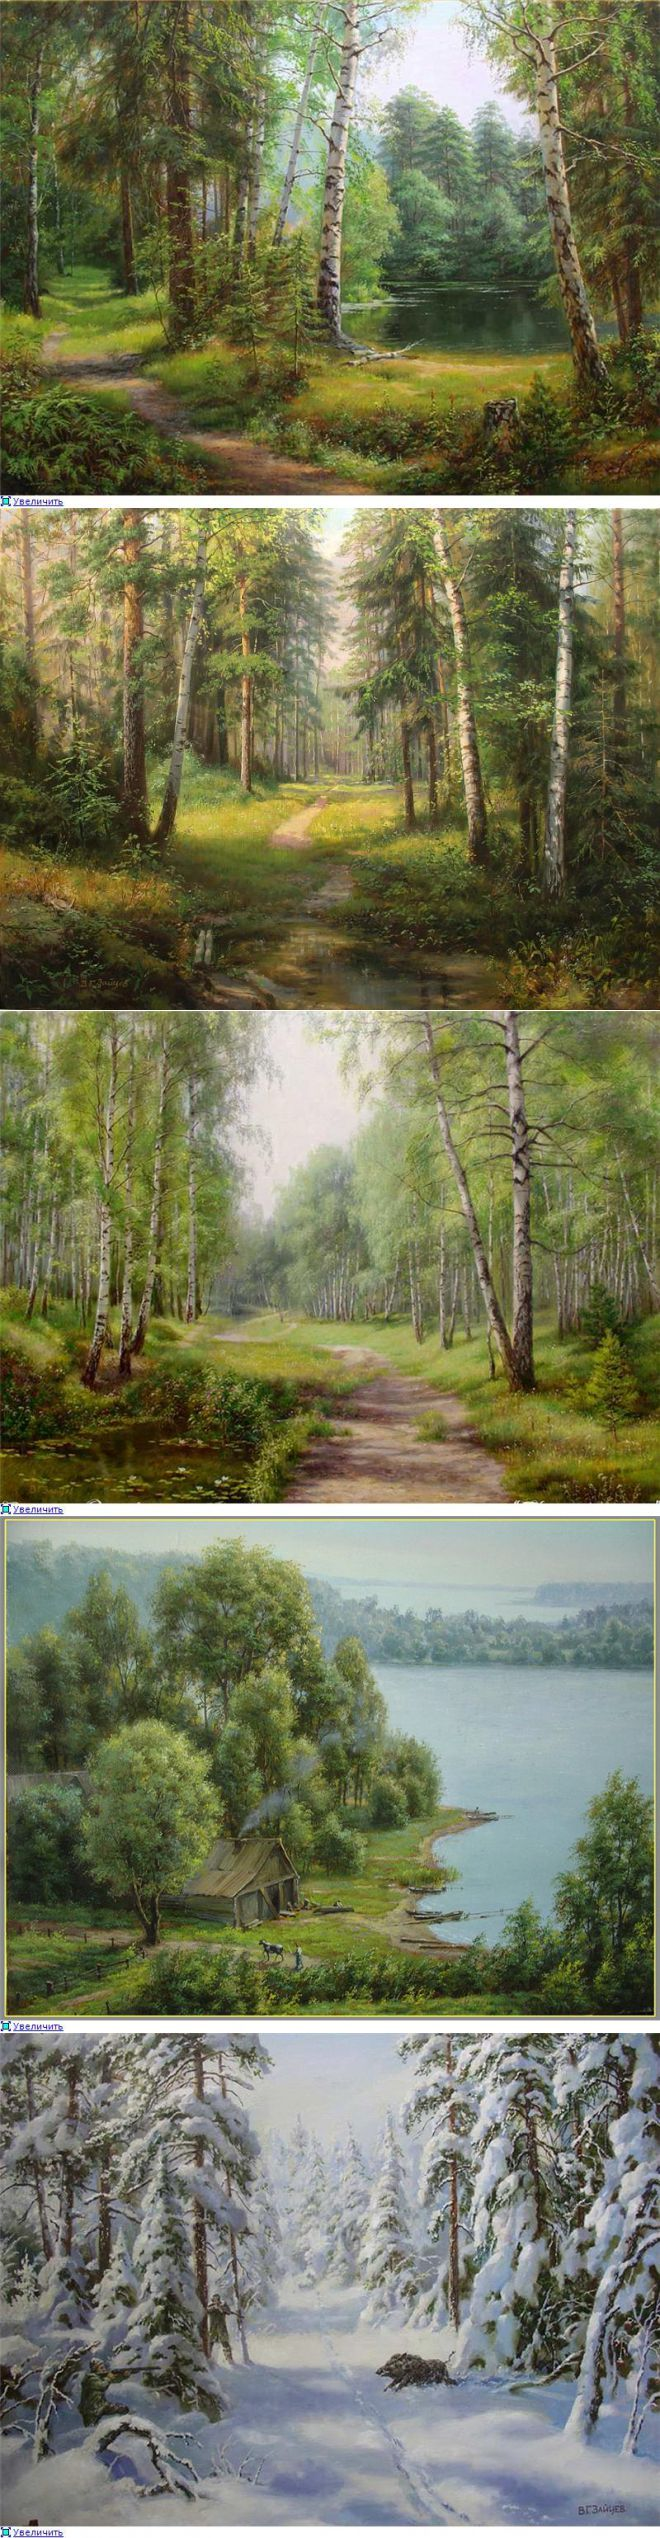 Шуми, шуми, зеленый лес! Зайцев Виталий Геннадьевич | искусство | Постила